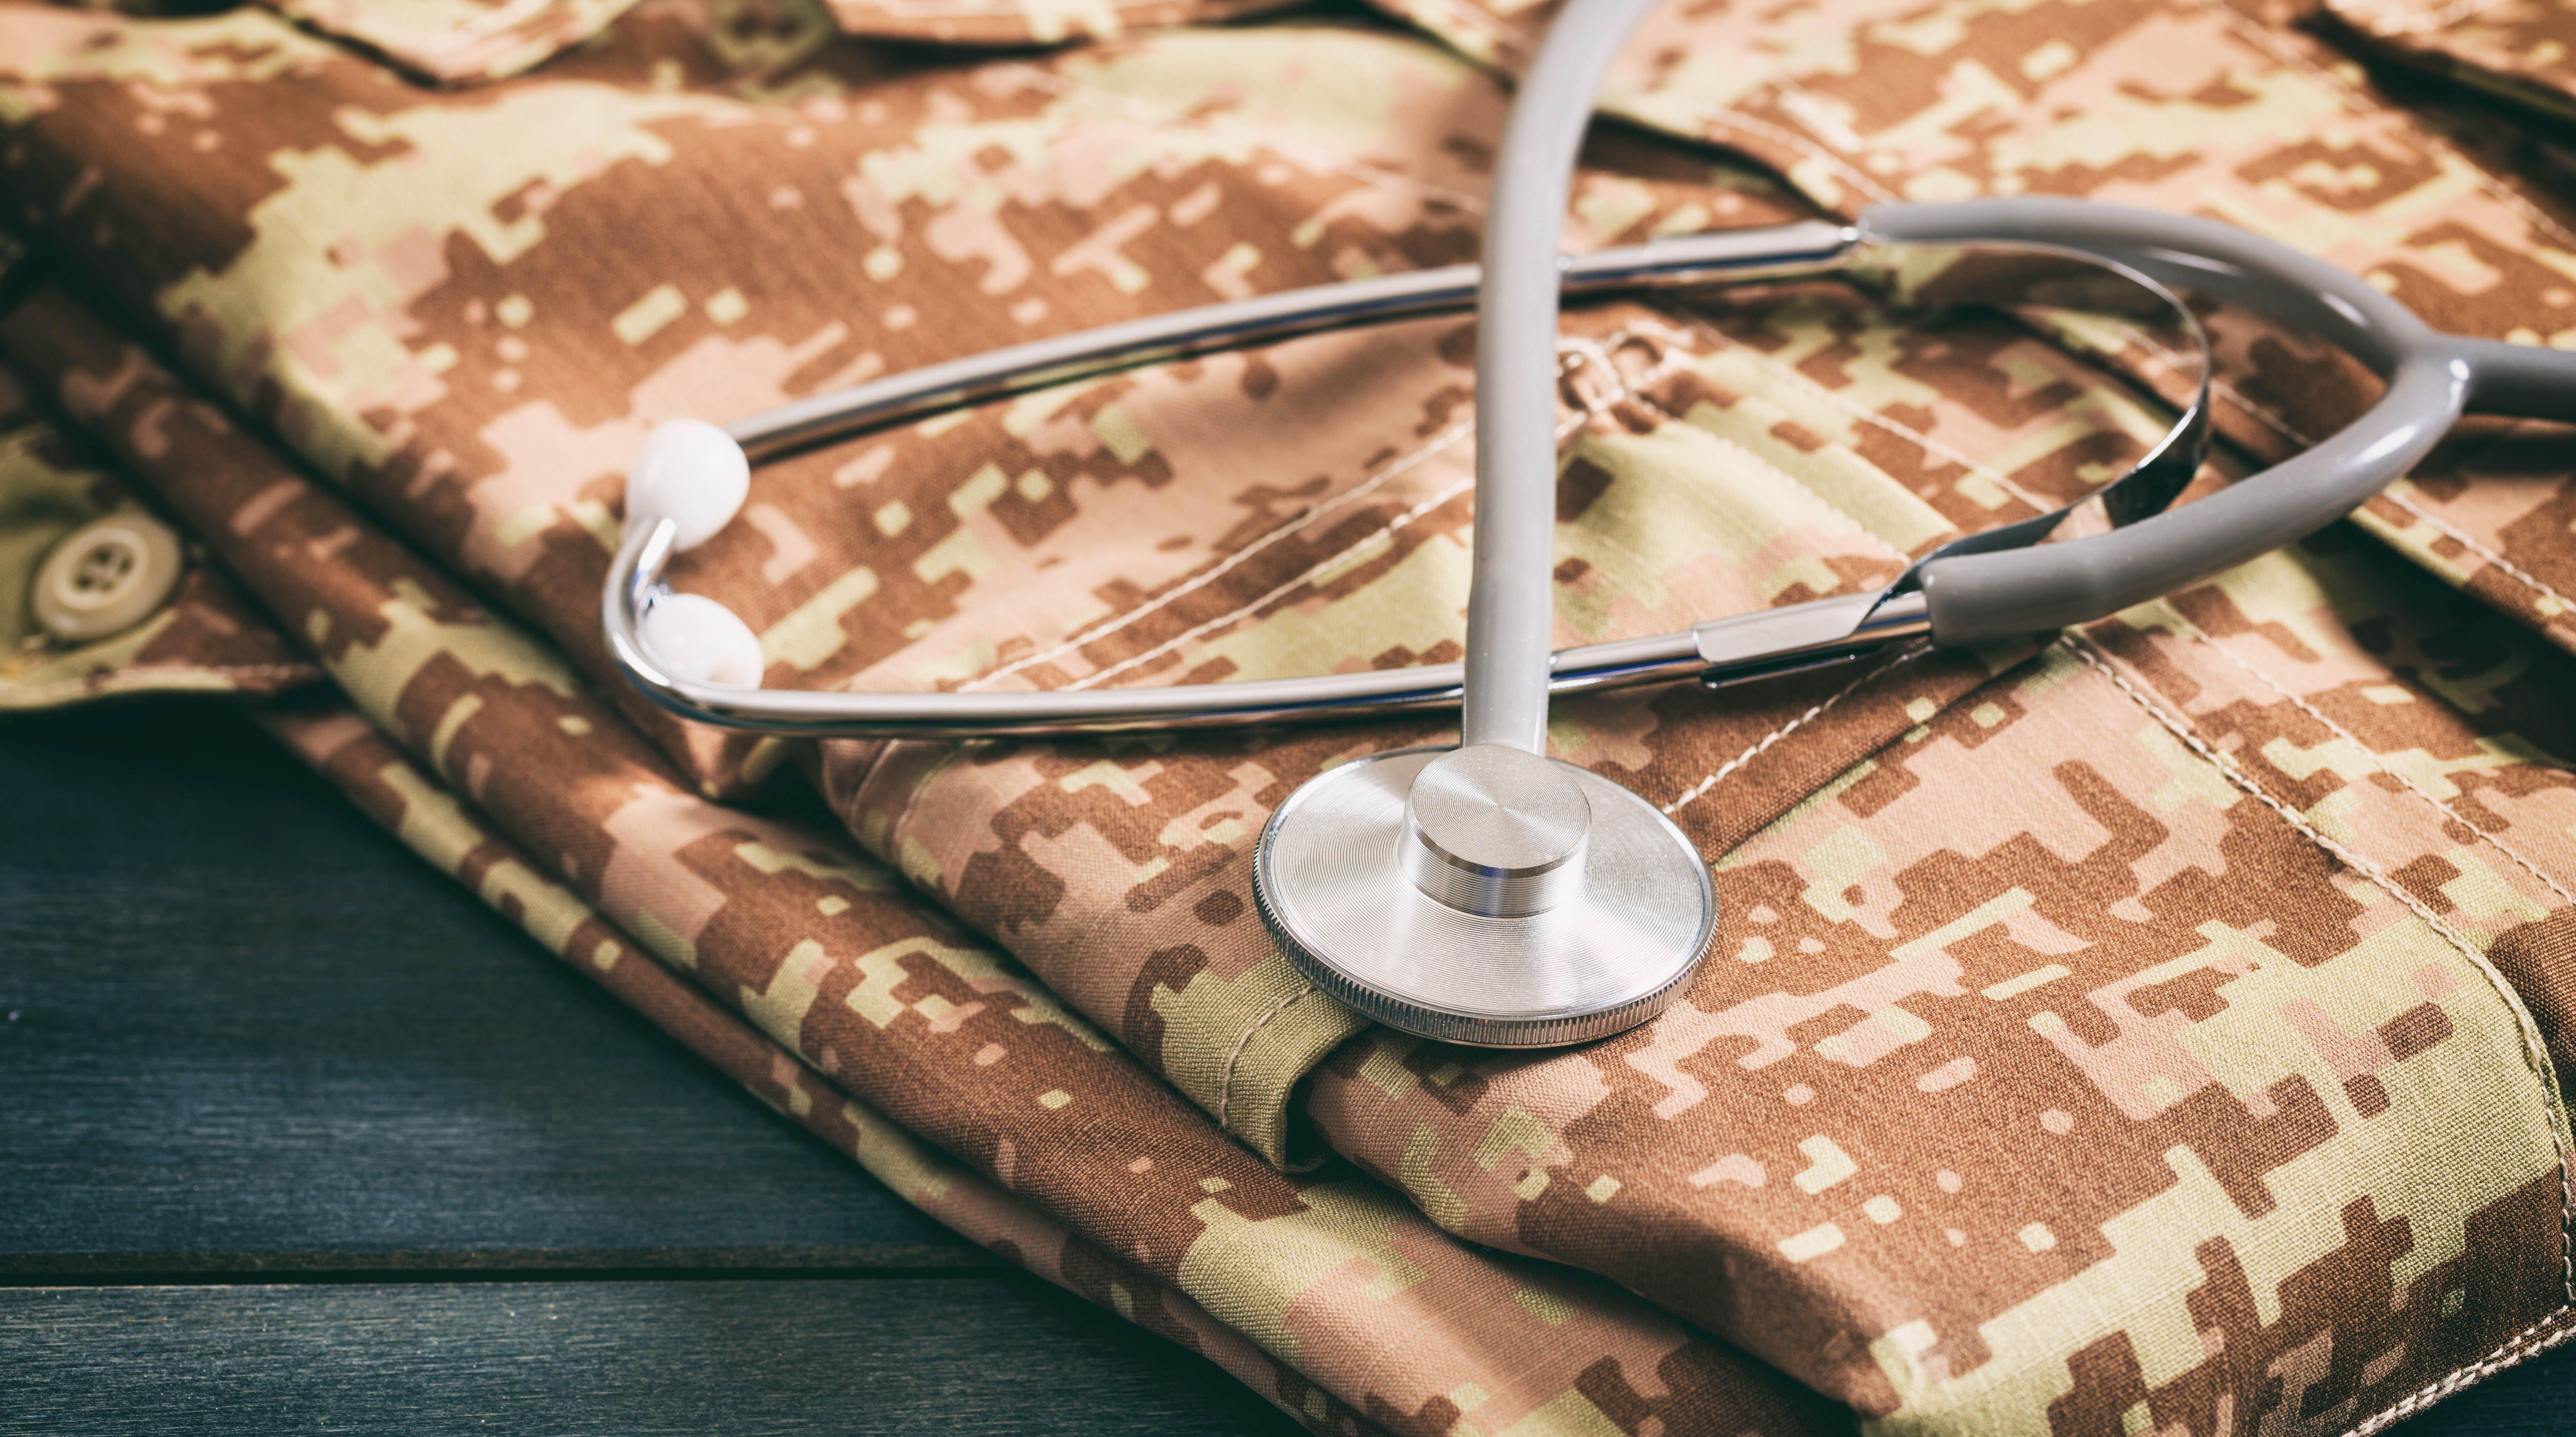 Military Uniform with Stethoscope